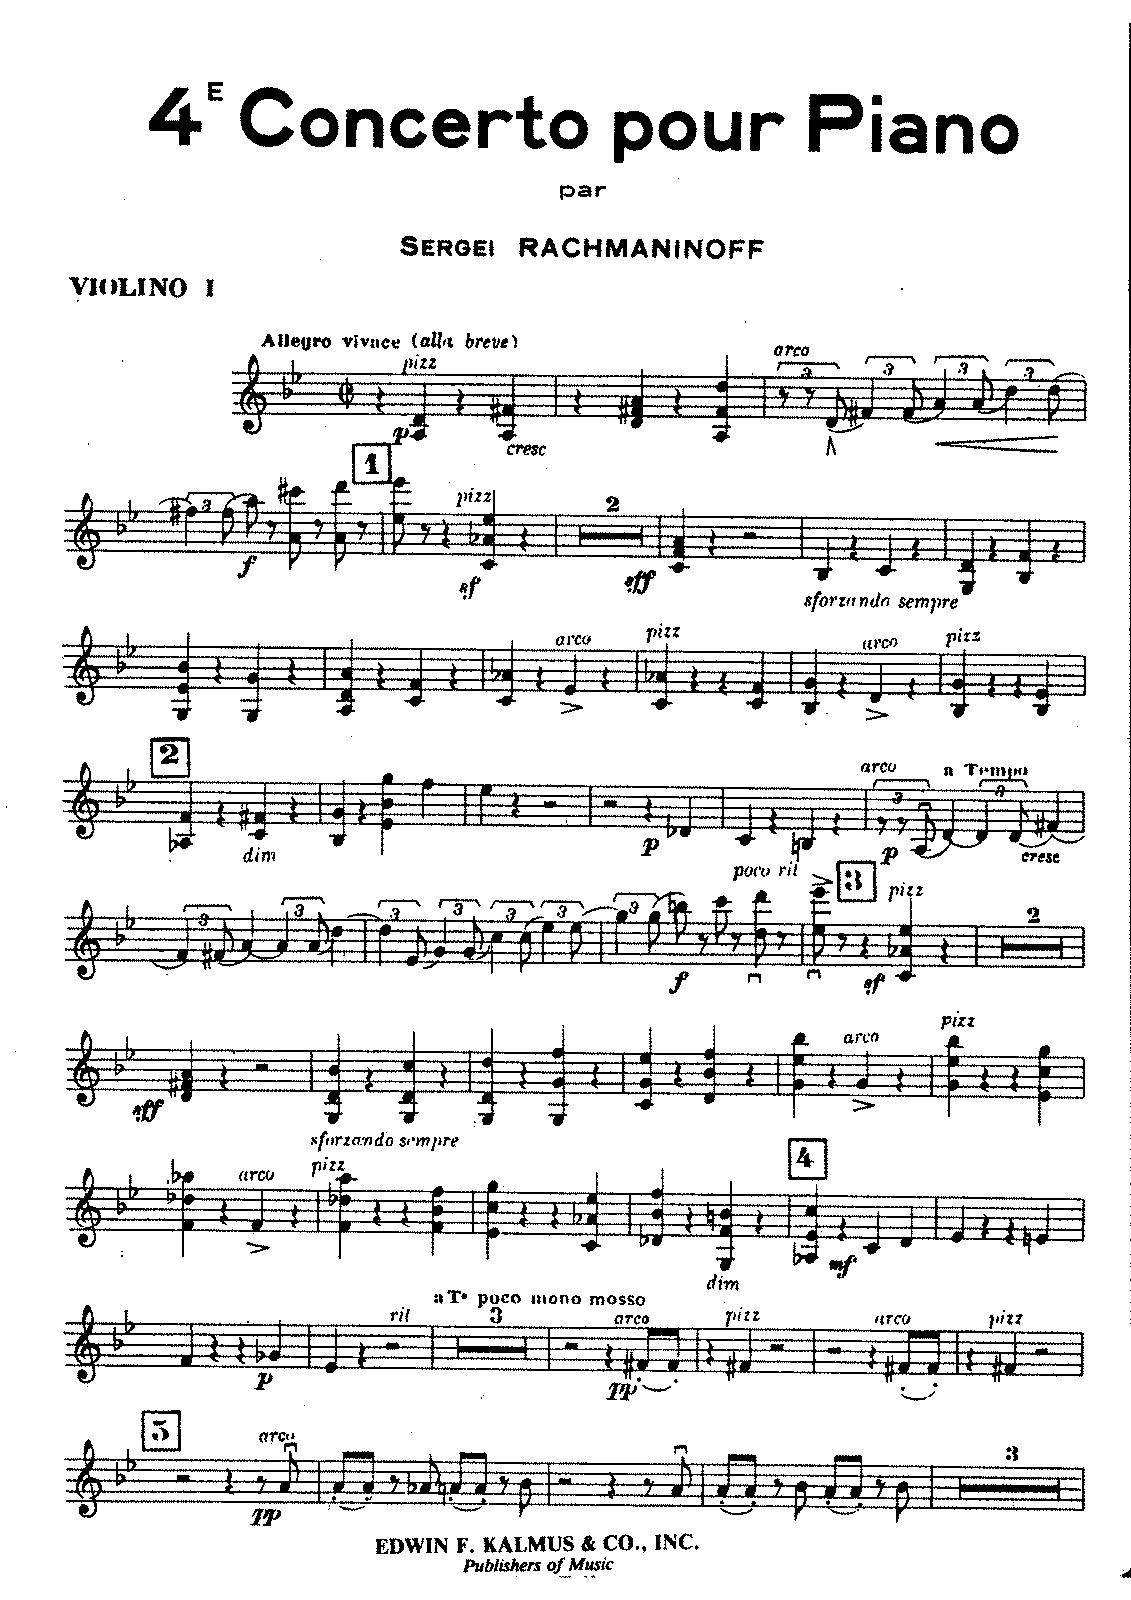 Rachmaninoff Piano Concerto No 4 In G Op 40 Rachmaninoff Piano Classical Music